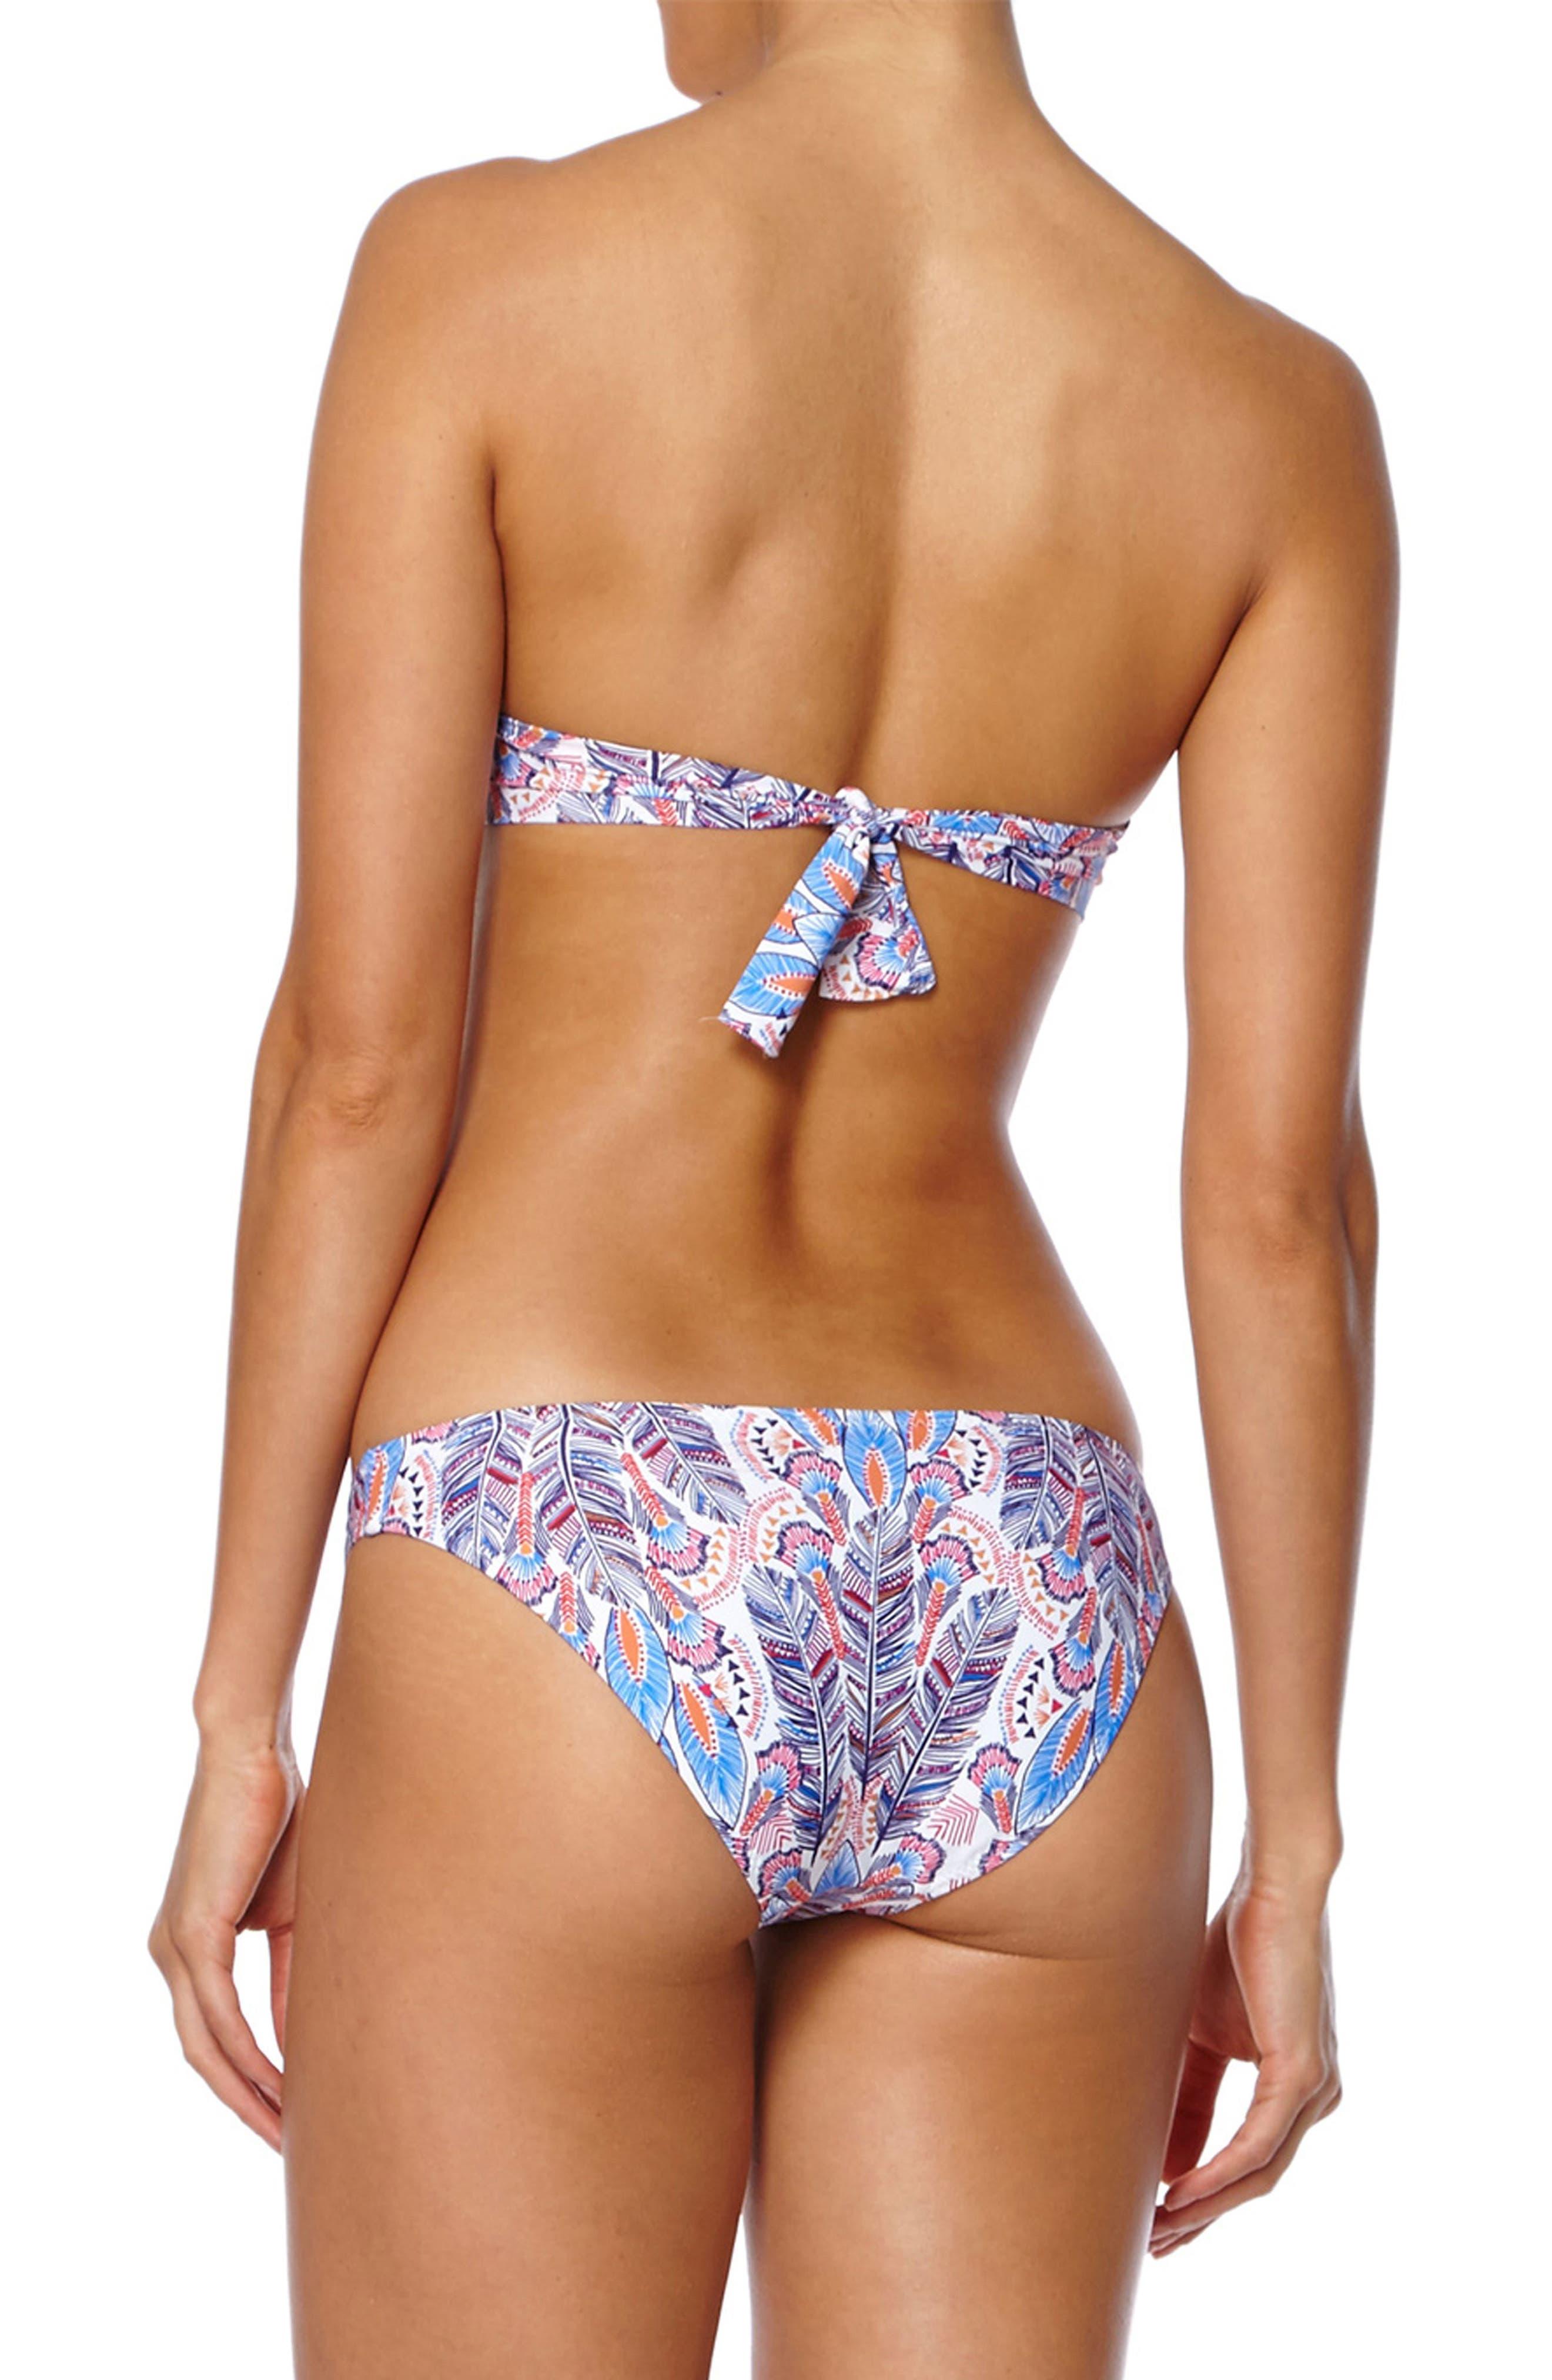 Martinique Bikini Bottoms,                             Alternate thumbnail 4, color,                             Feathers